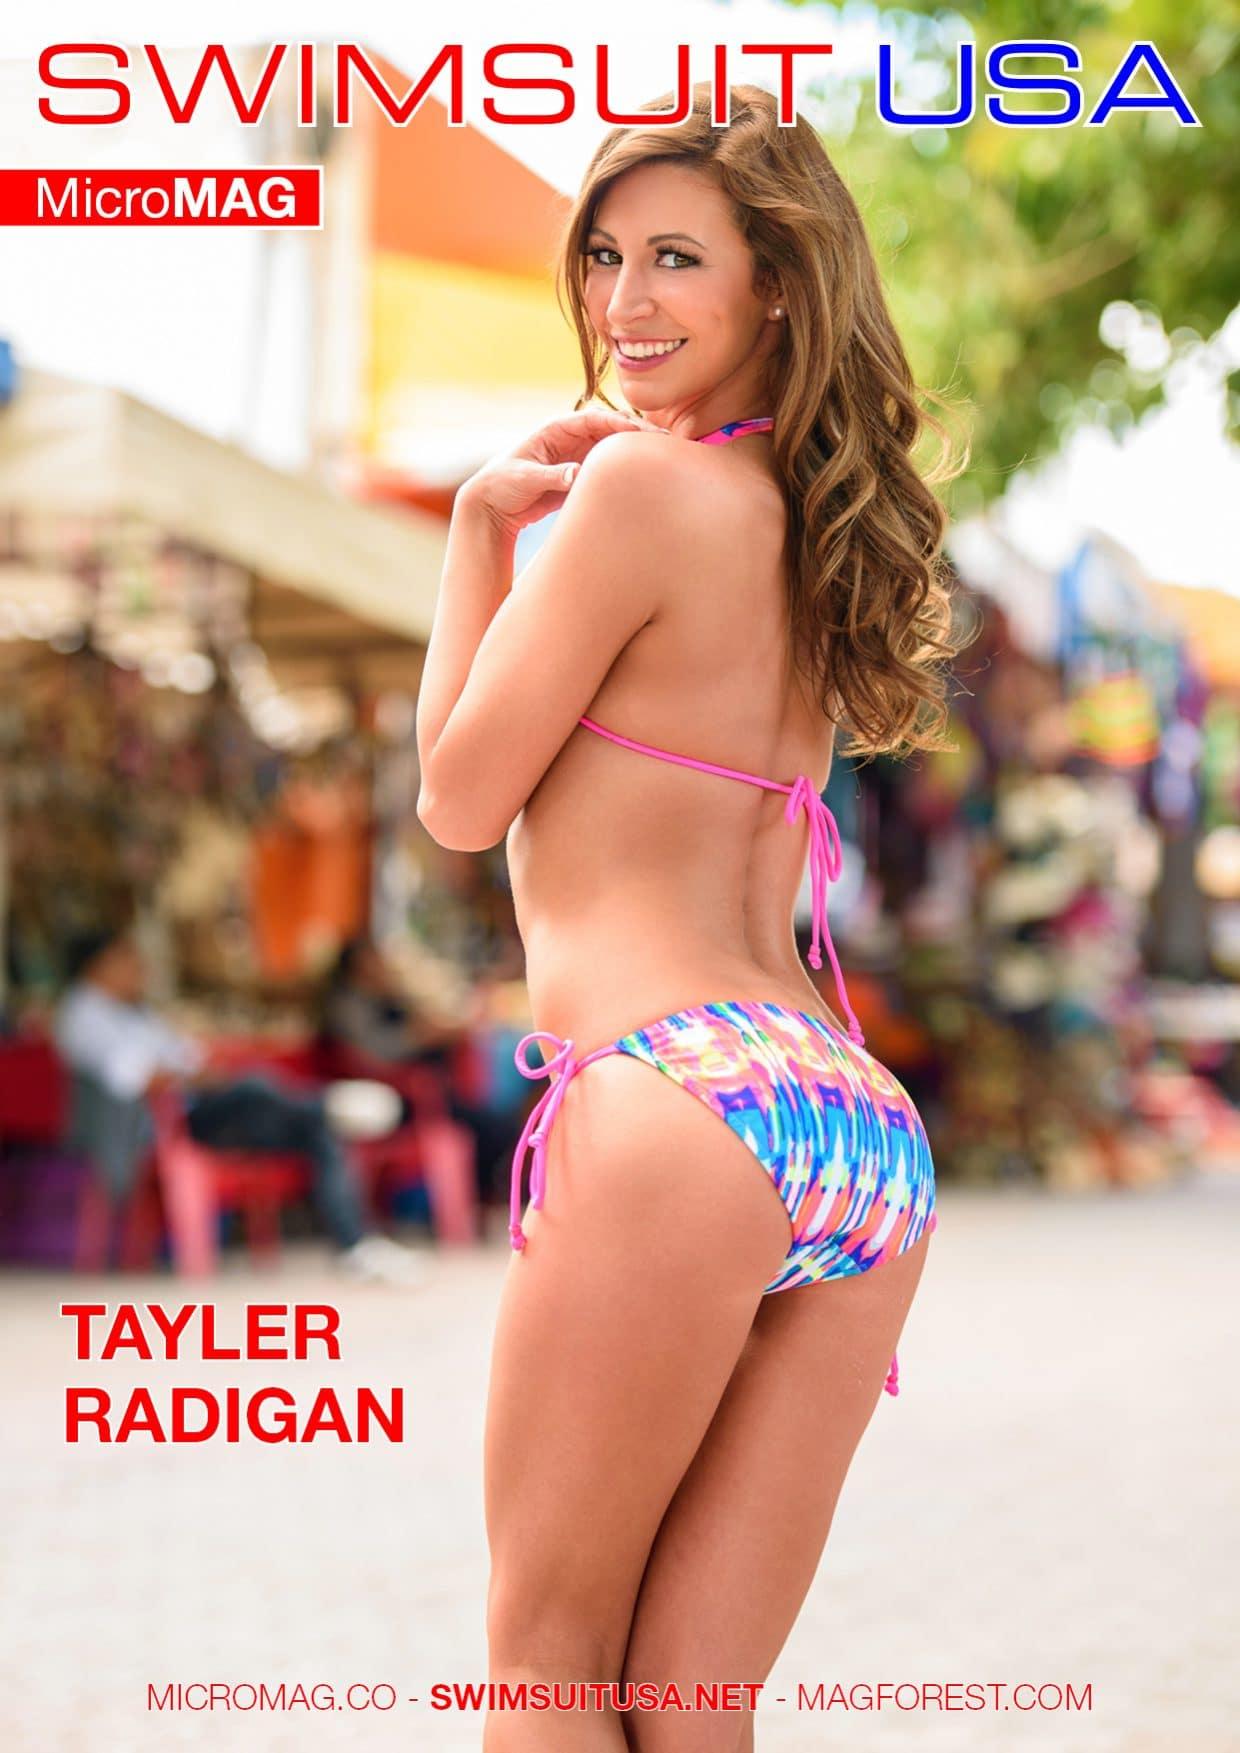 Swimsuit Usa Micromag – Tayler Radigan – Issue 2